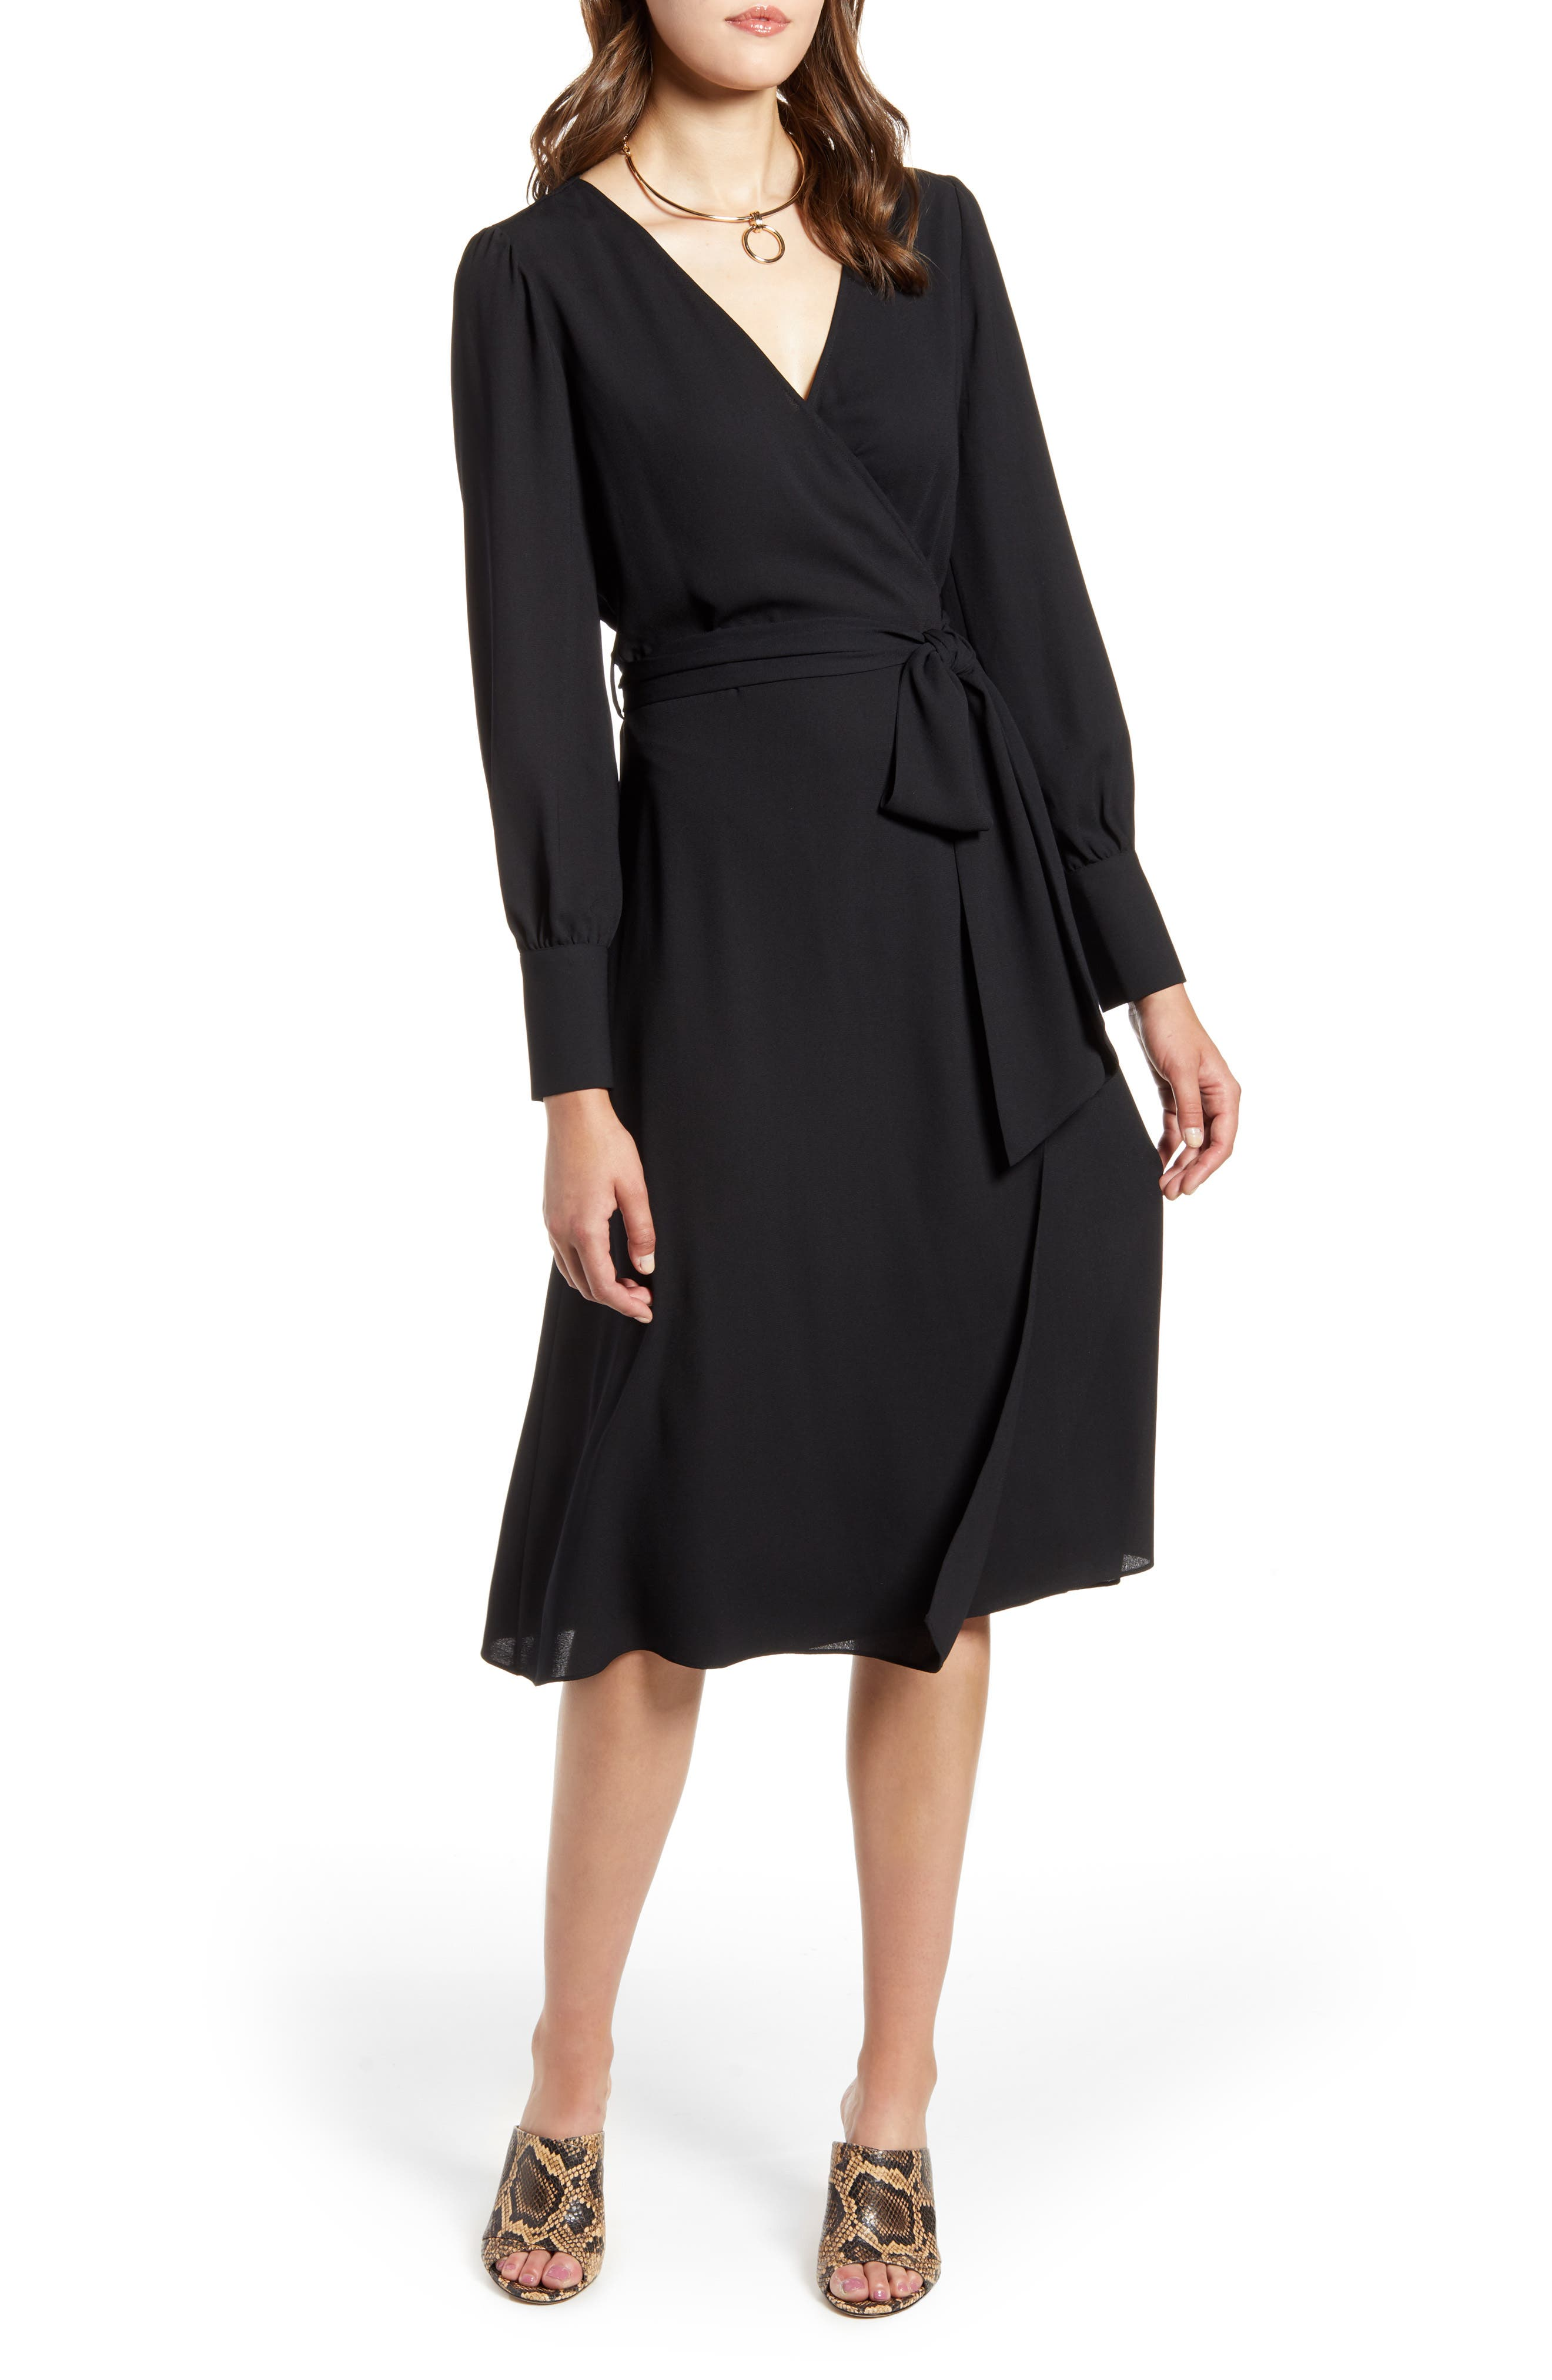 1940s Cocktail Dresses, Party Dresses Womens Halogen Long Sleeve Wrap Midi Dress Size Large - Black $99.00 AT vintagedancer.com